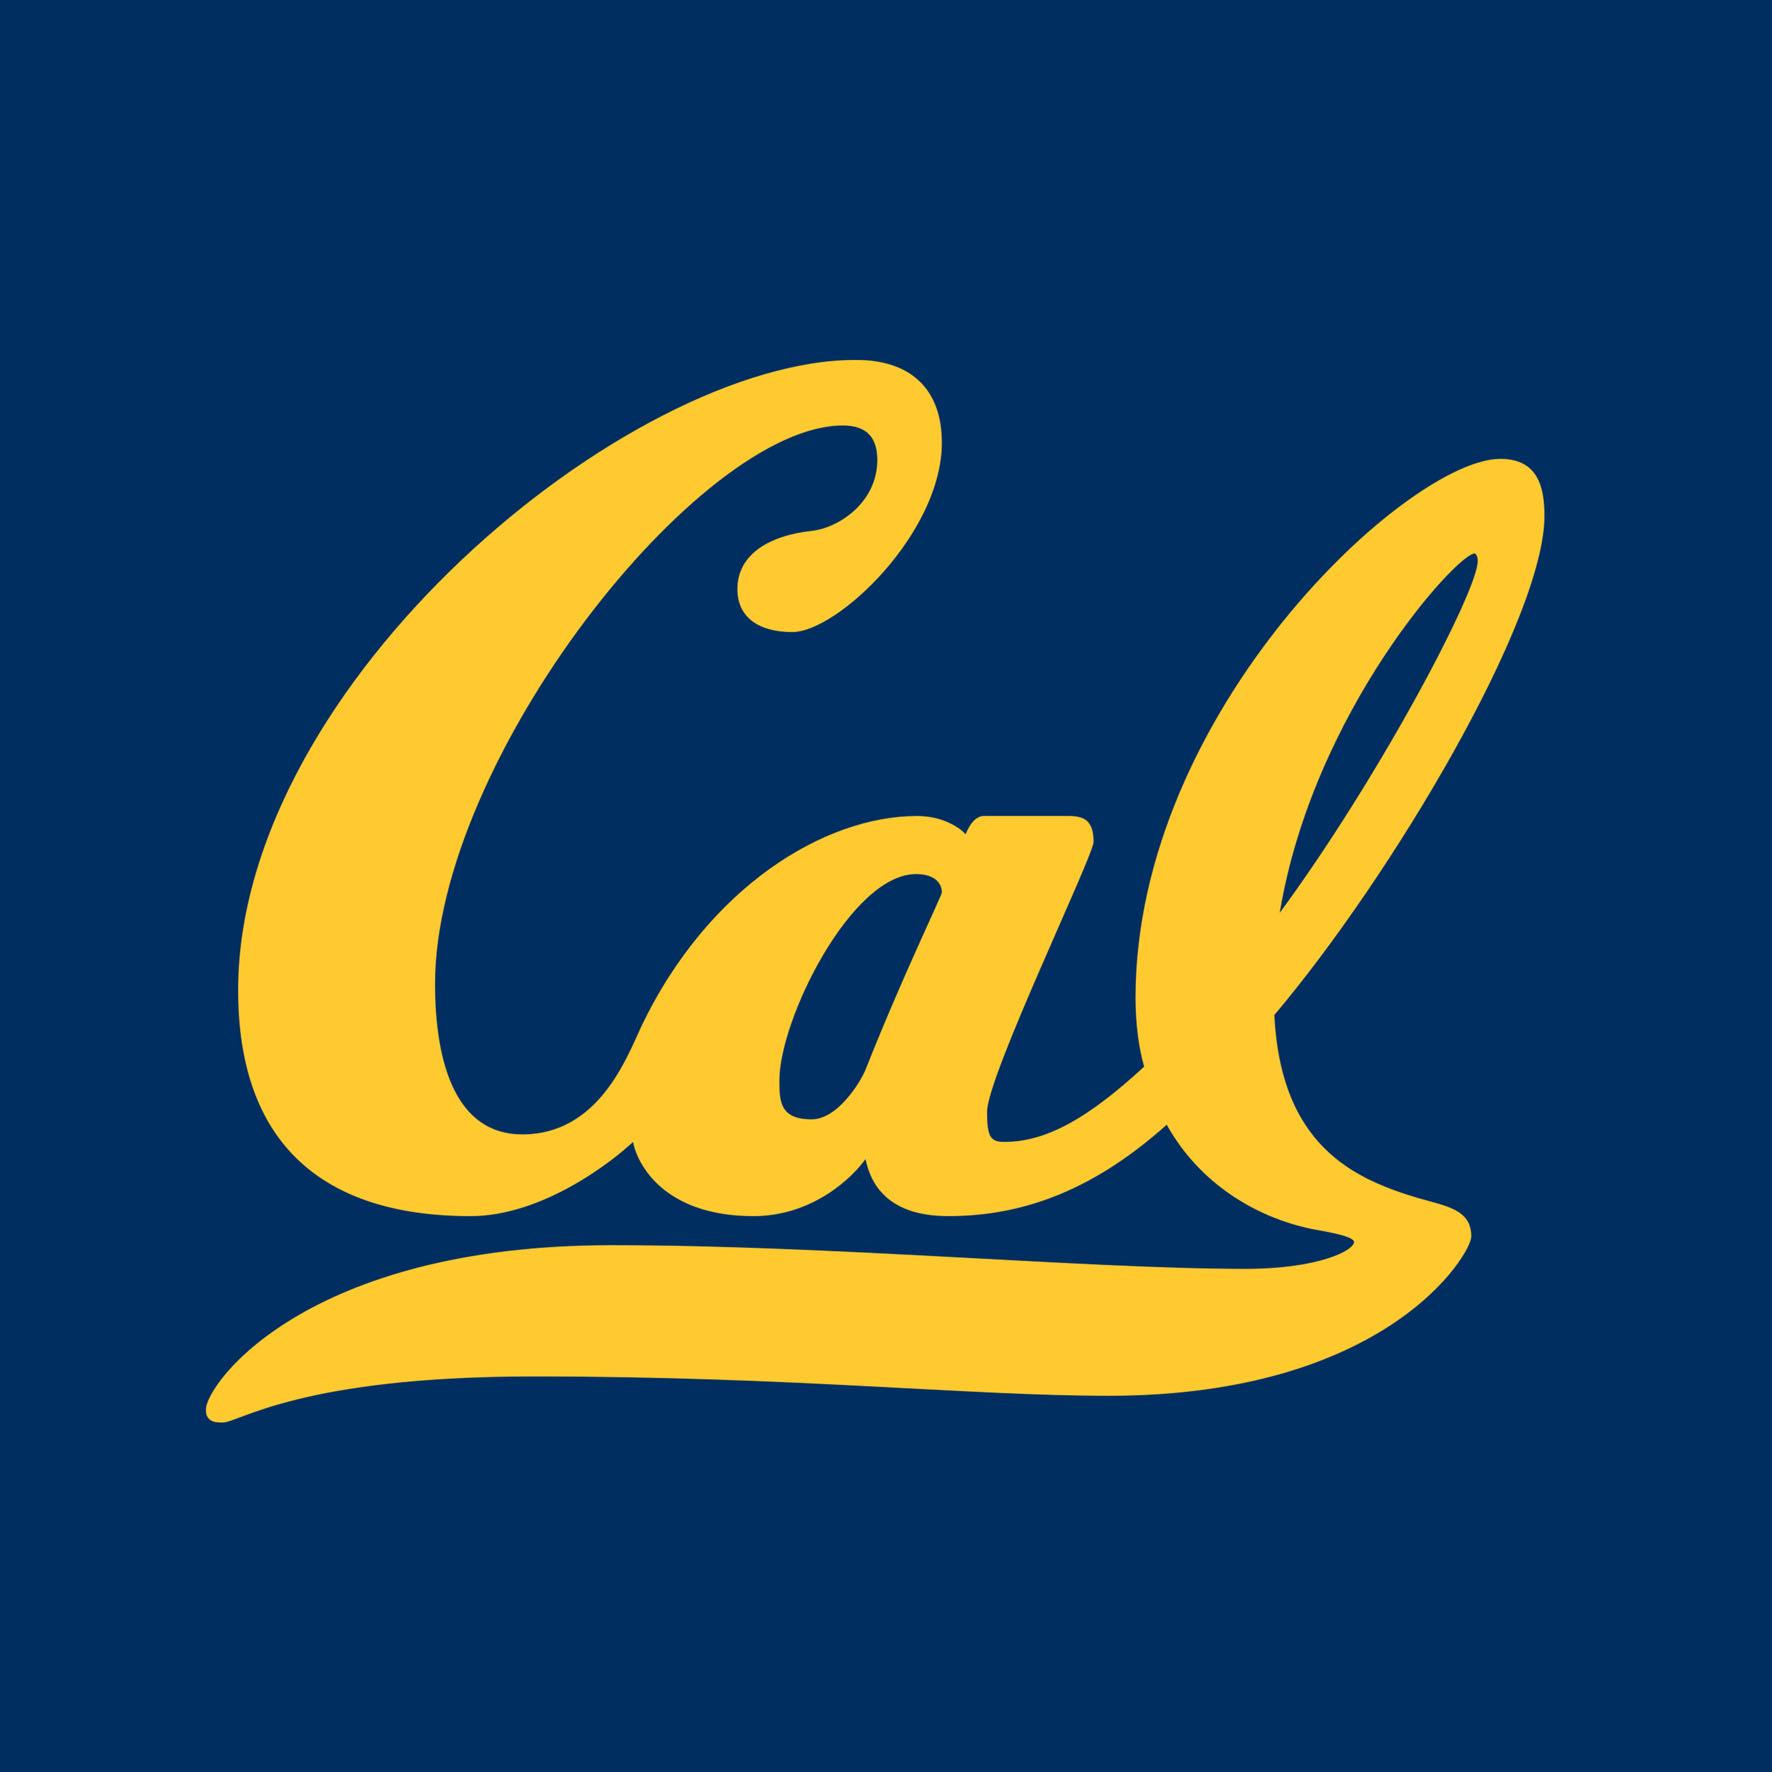 Cal Berkley University  Endowment Seating Program